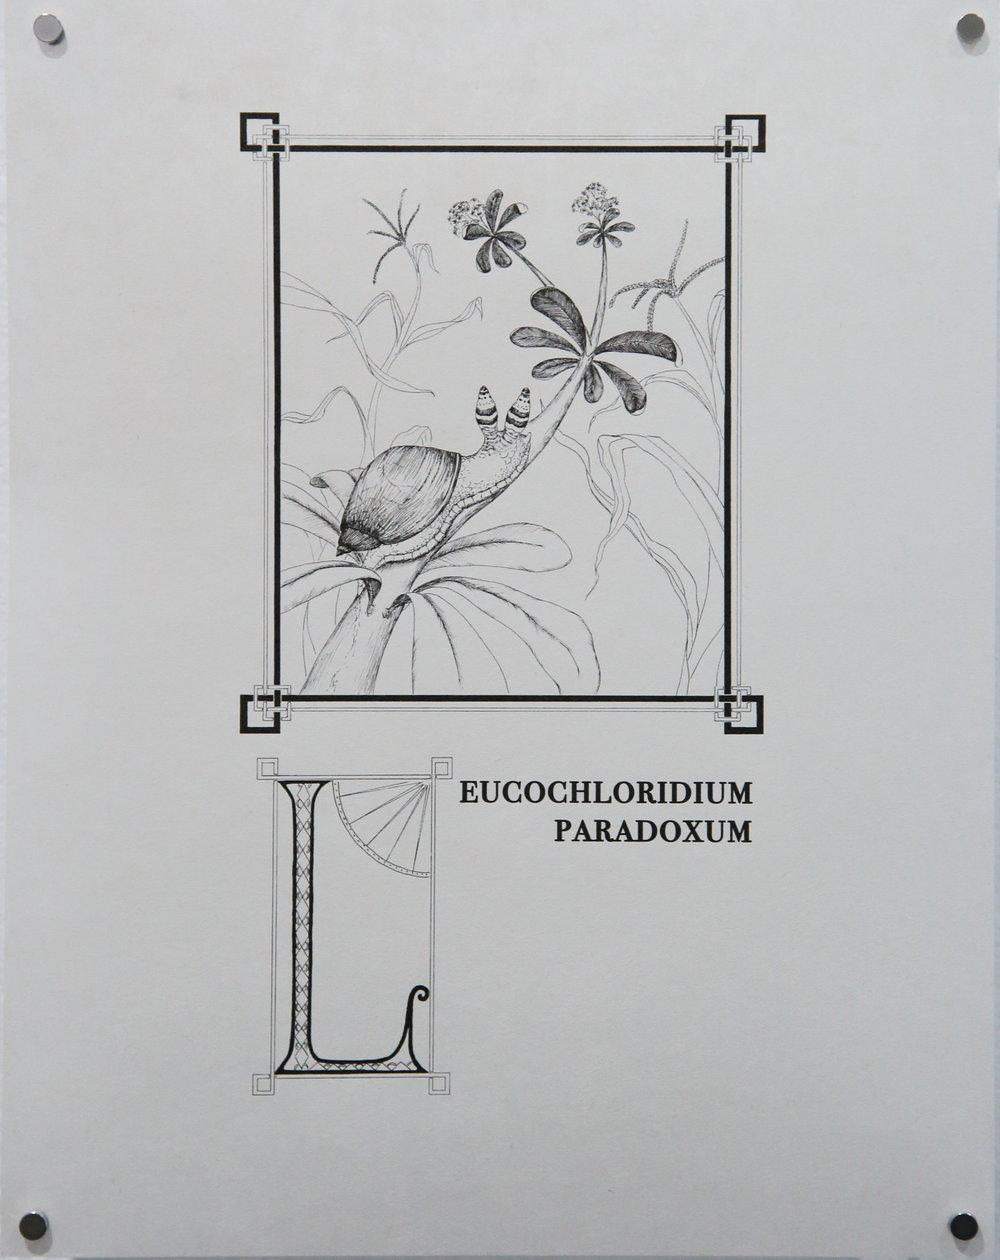 Leucochloridium paradoxum